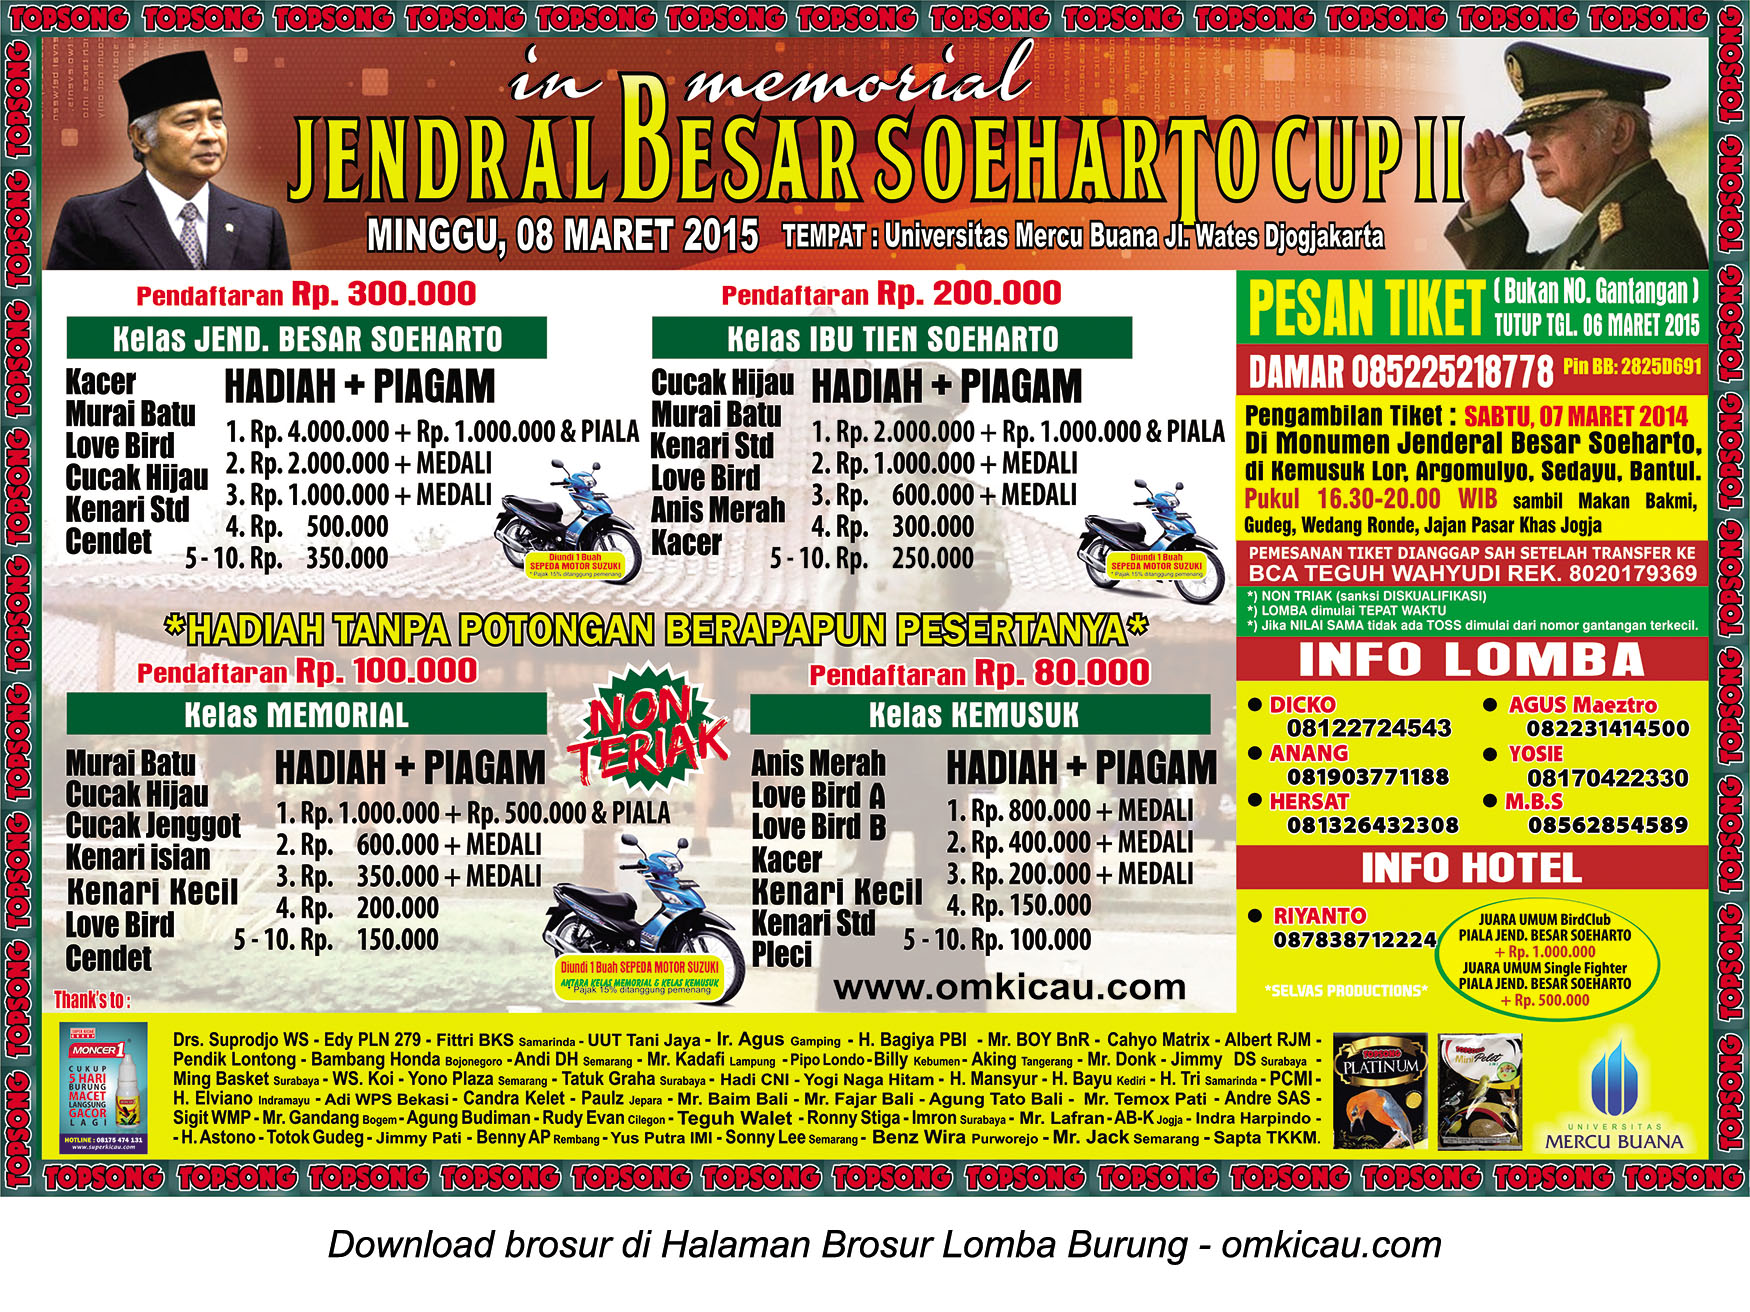 Brosur Lomba Burung Berkicau Jendral Besar Soeharto Cup II, Jogja, 8 Maret 2015